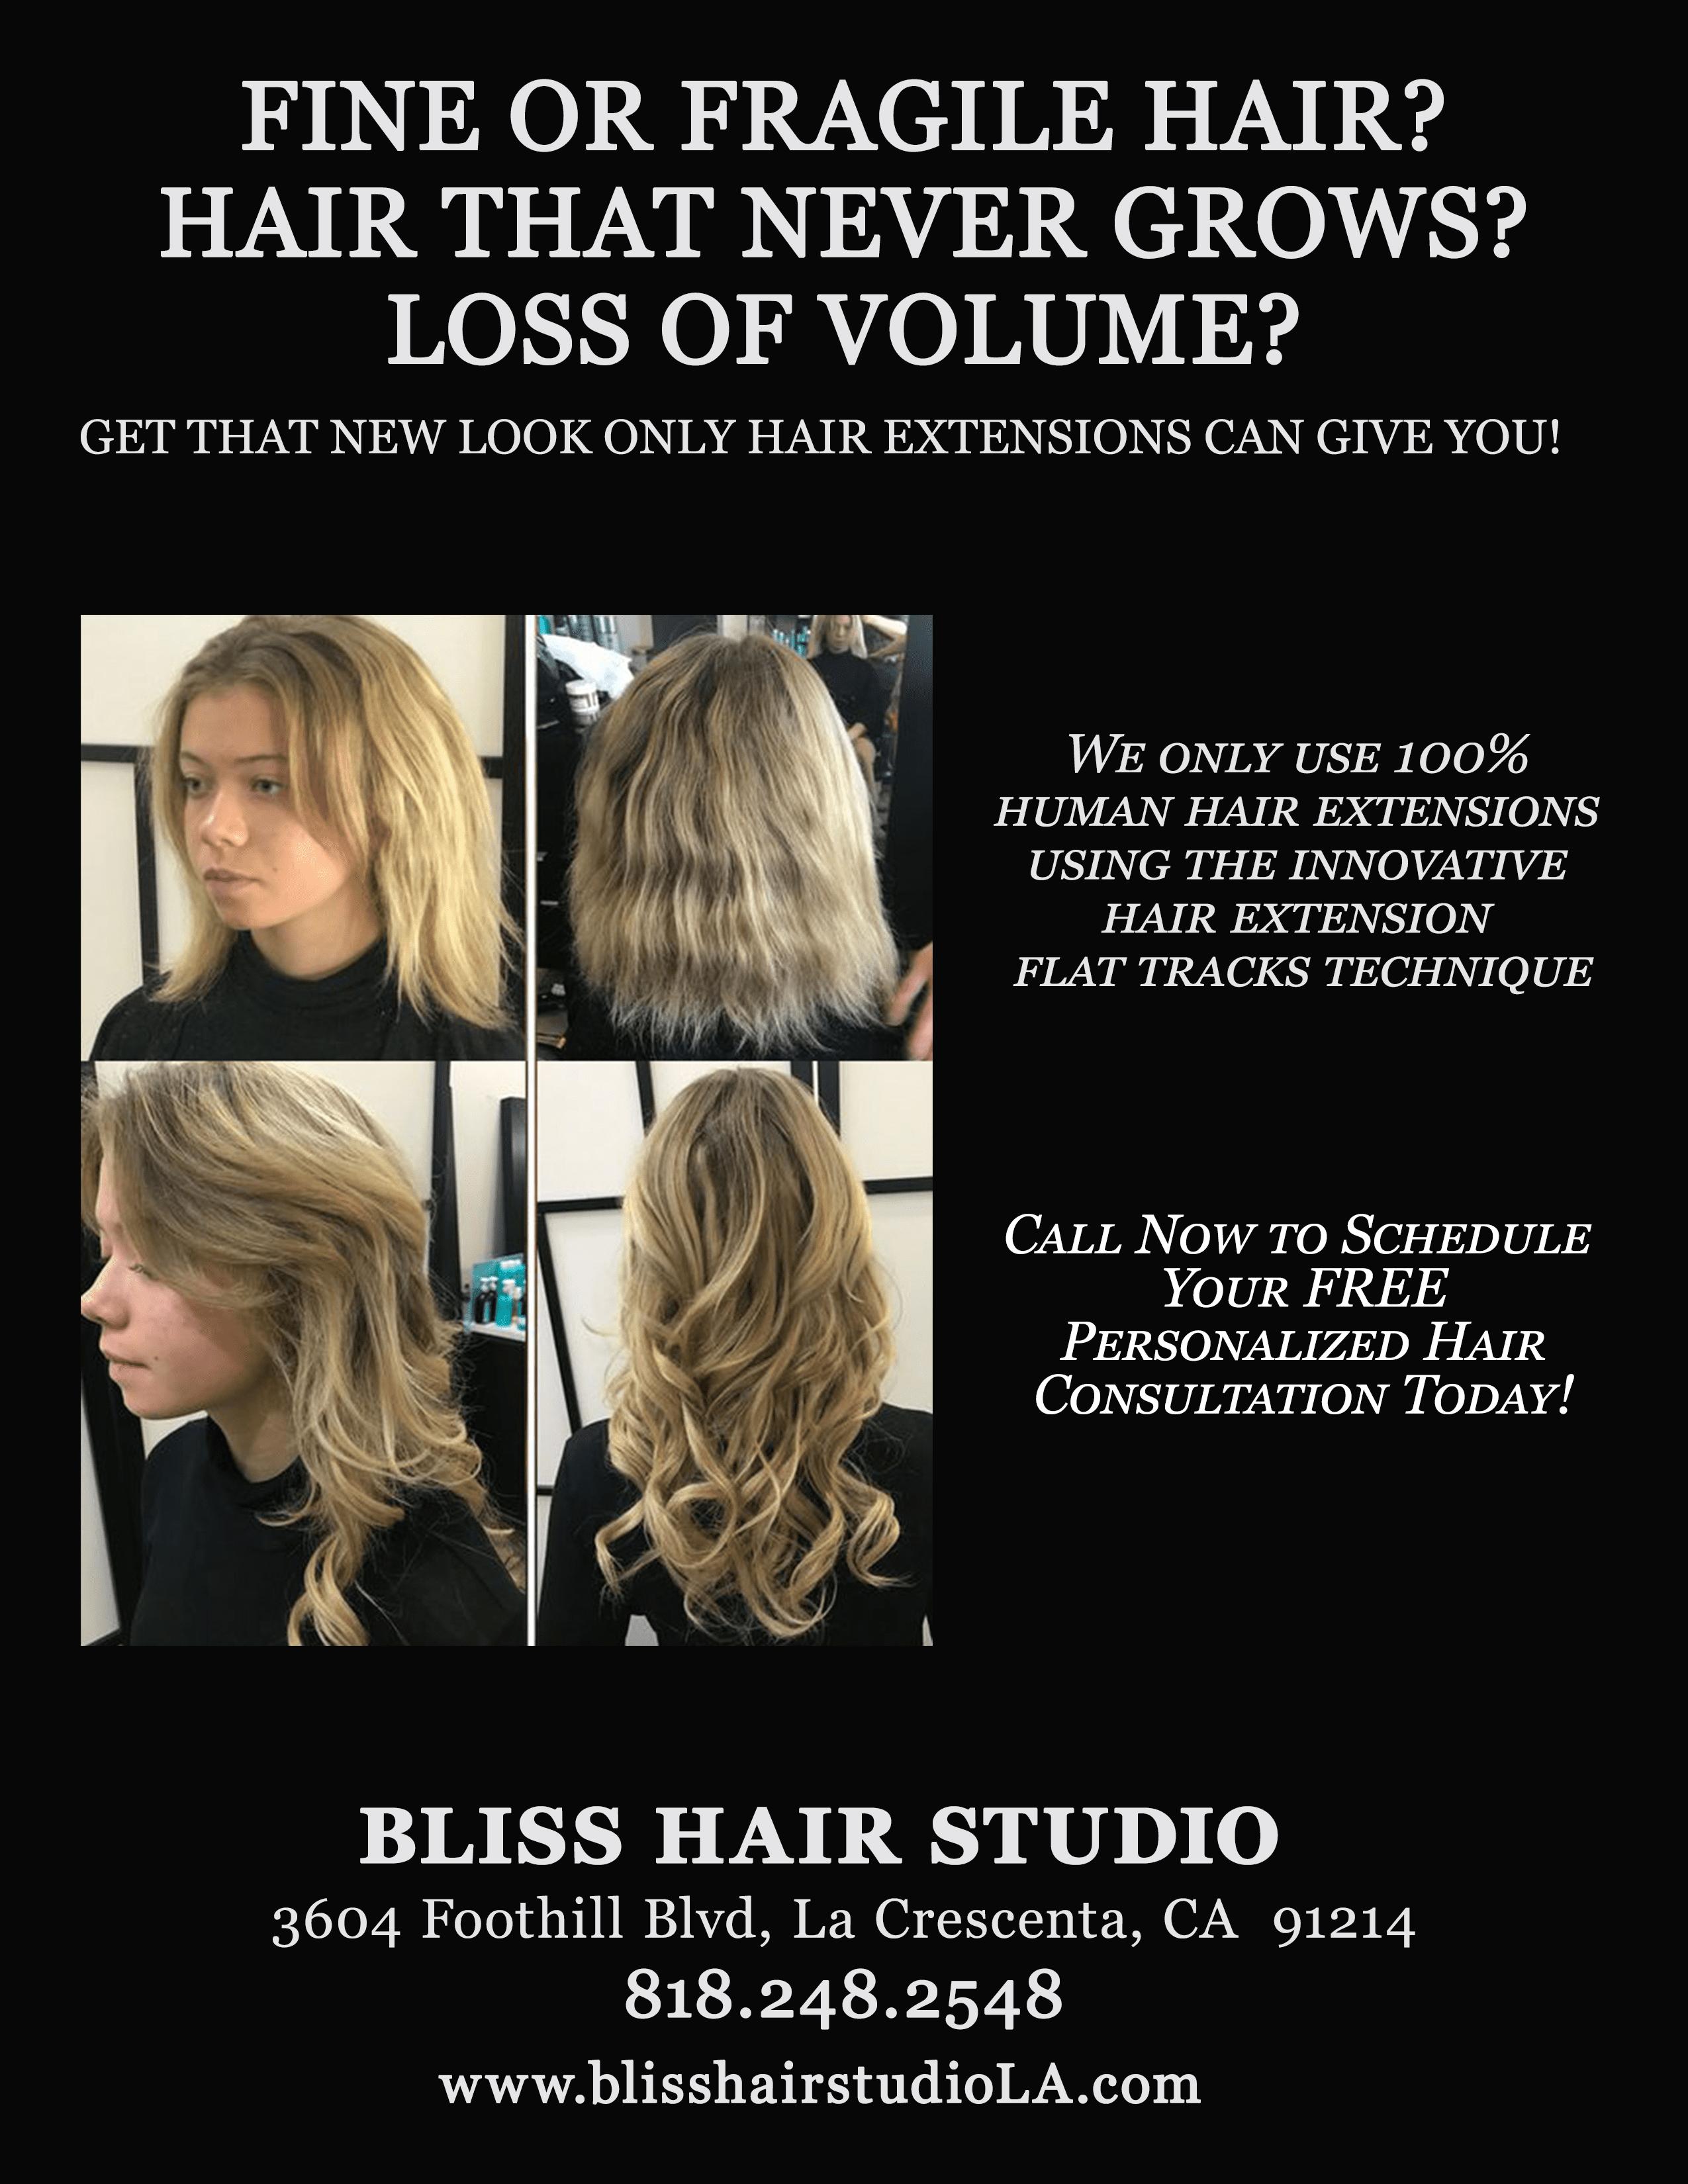 Hair Extensions Promo 10 2017r Bliss Hair Studio